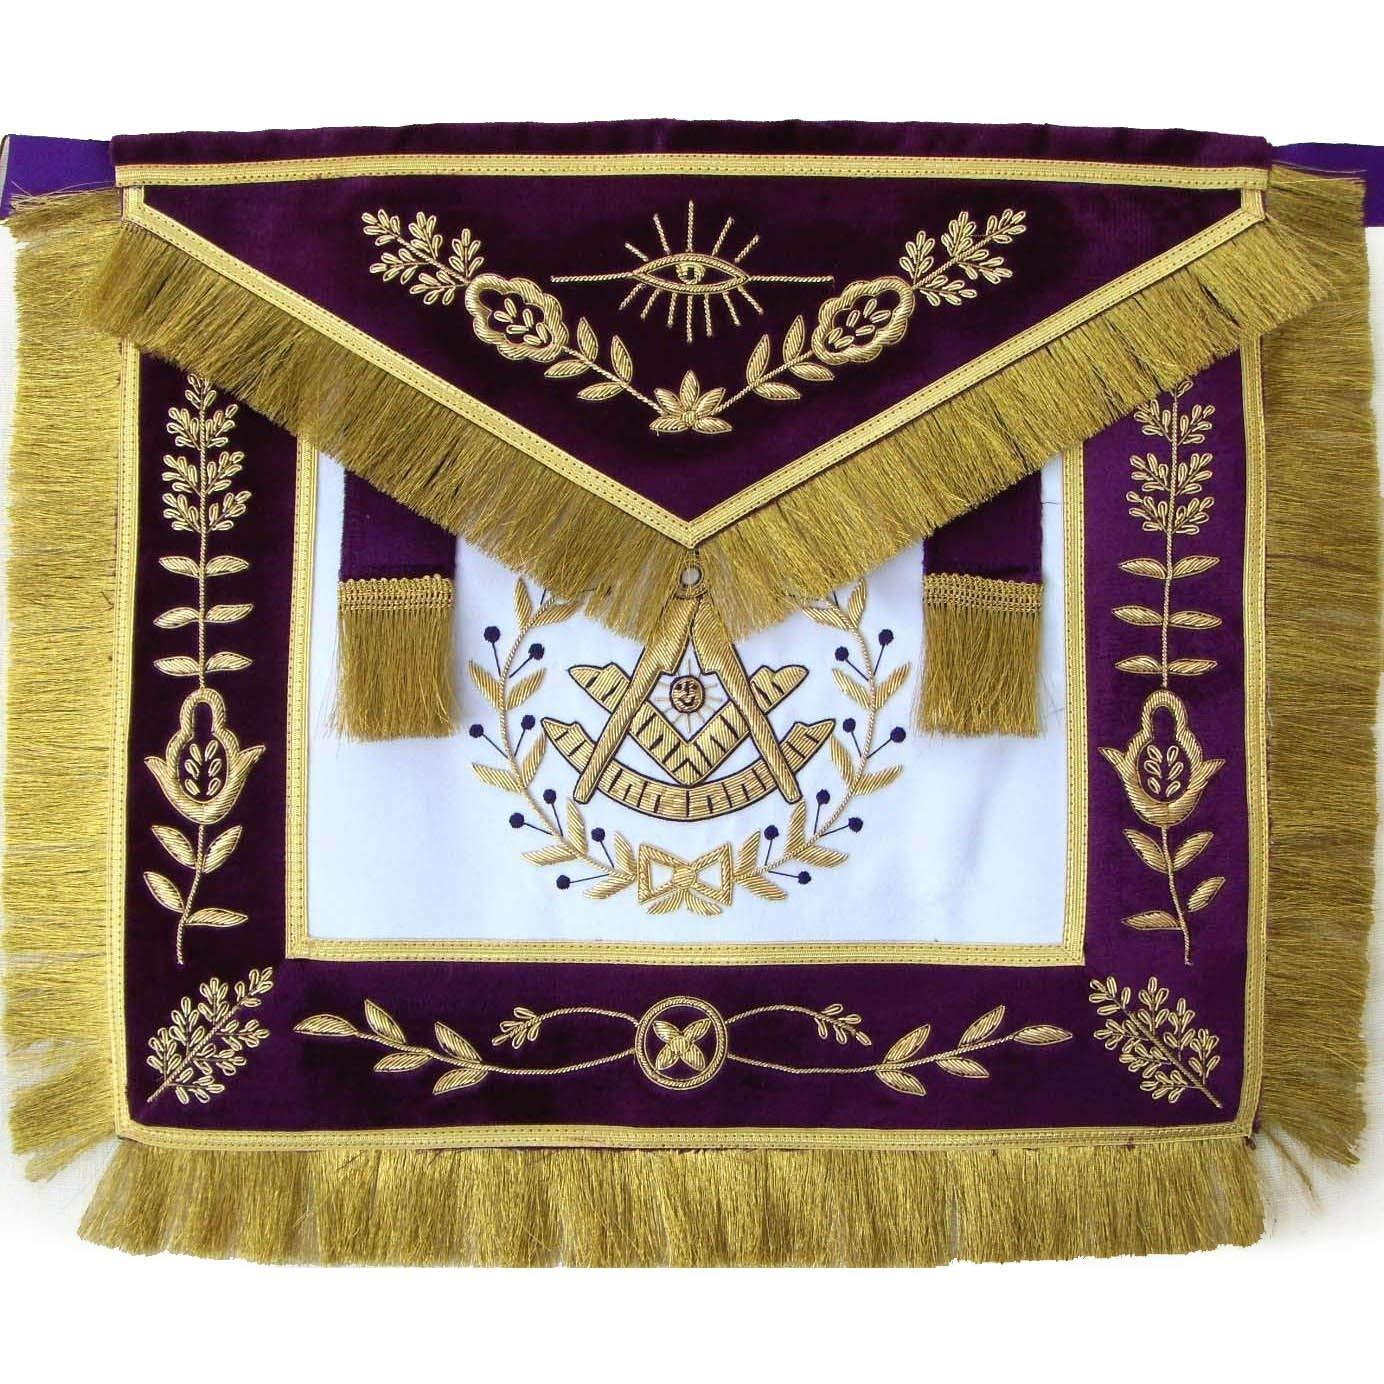 Bricks Masons Masonic Grand Lodge Past マスターエプロン 手刺繍  Lambskin B07JKQNTBV